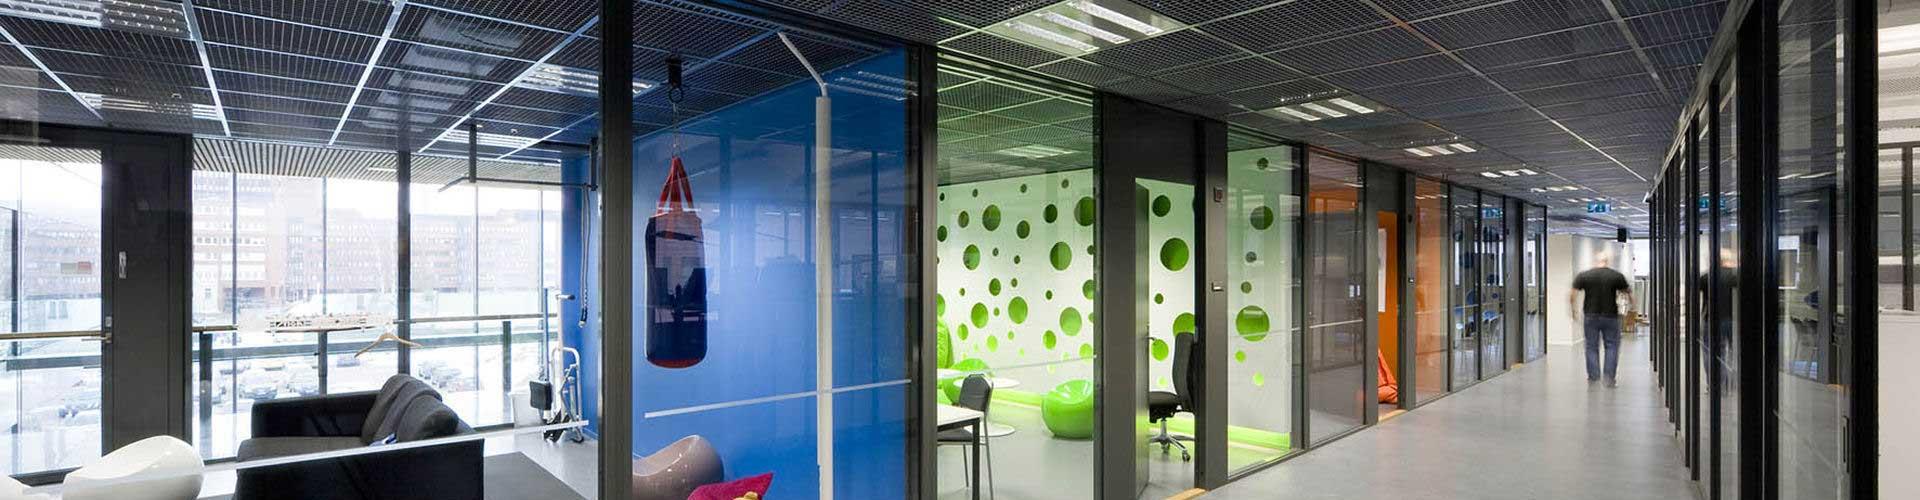 Open grid ceiling tiles